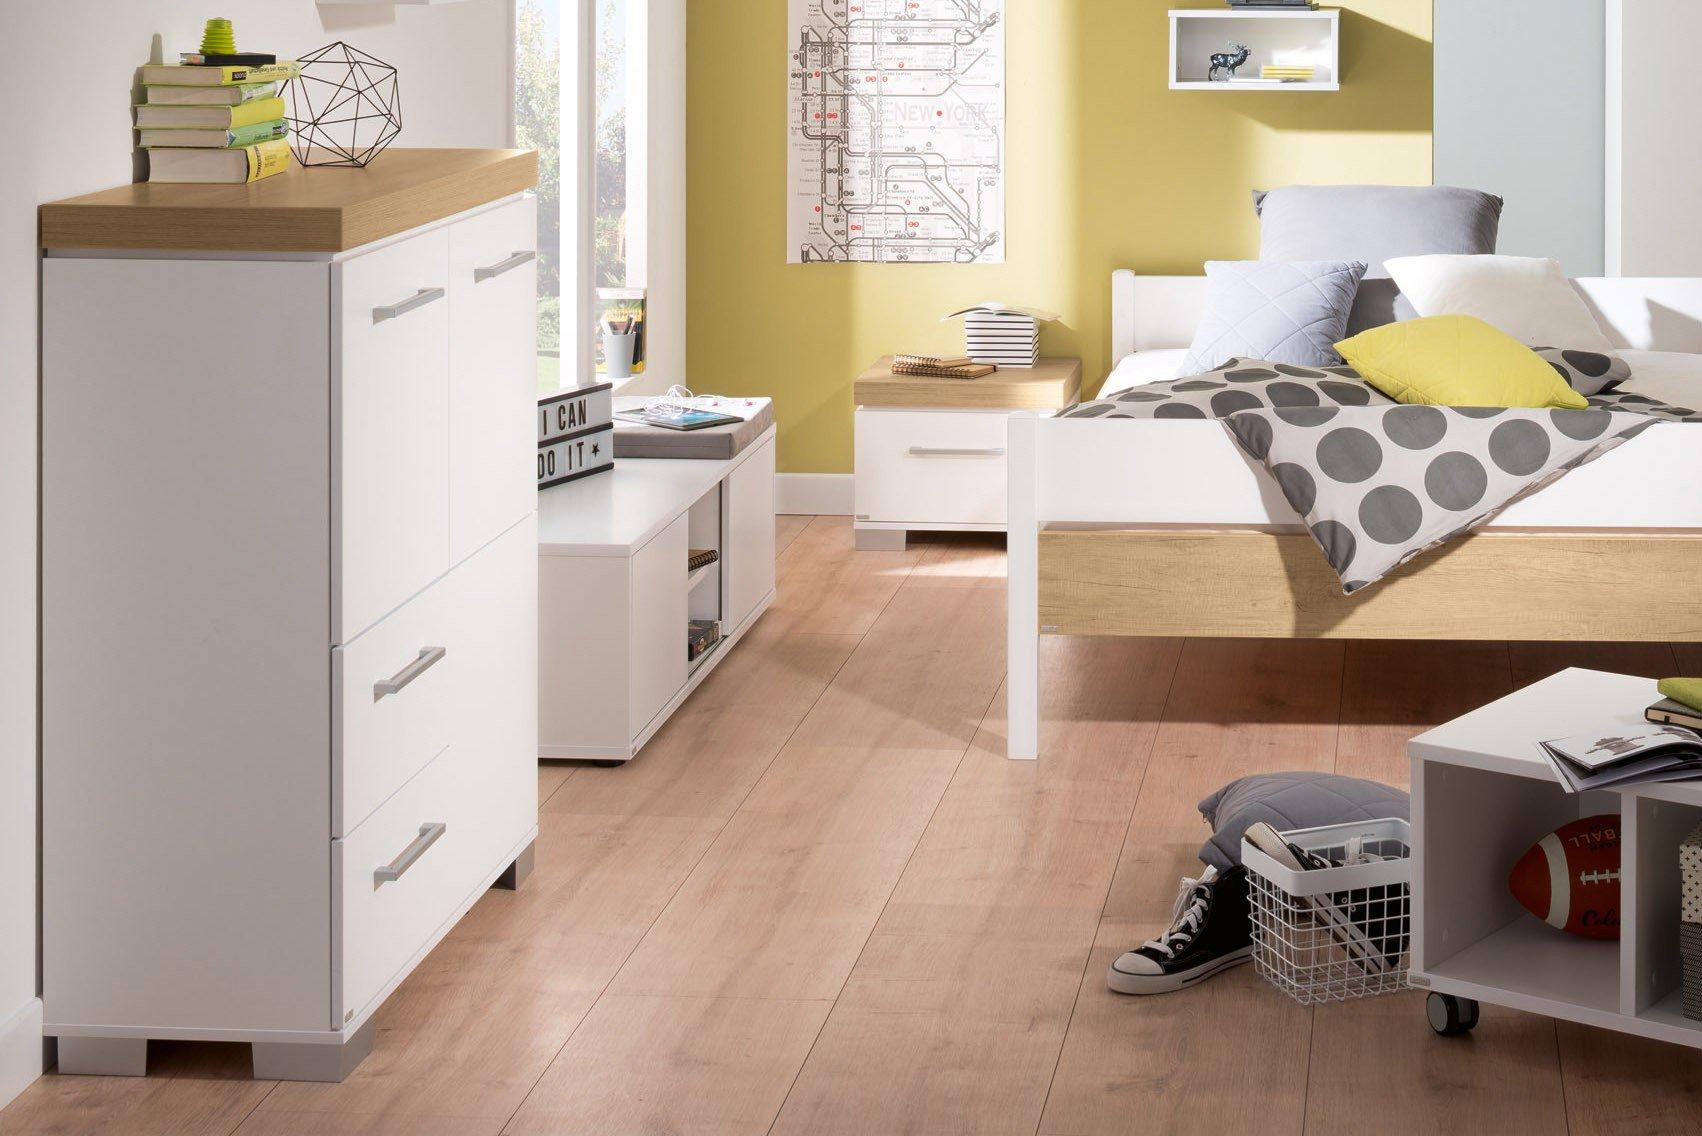 paidi highboard kira eiche nebraska kreidewei m bel letz ihr online shop. Black Bedroom Furniture Sets. Home Design Ideas